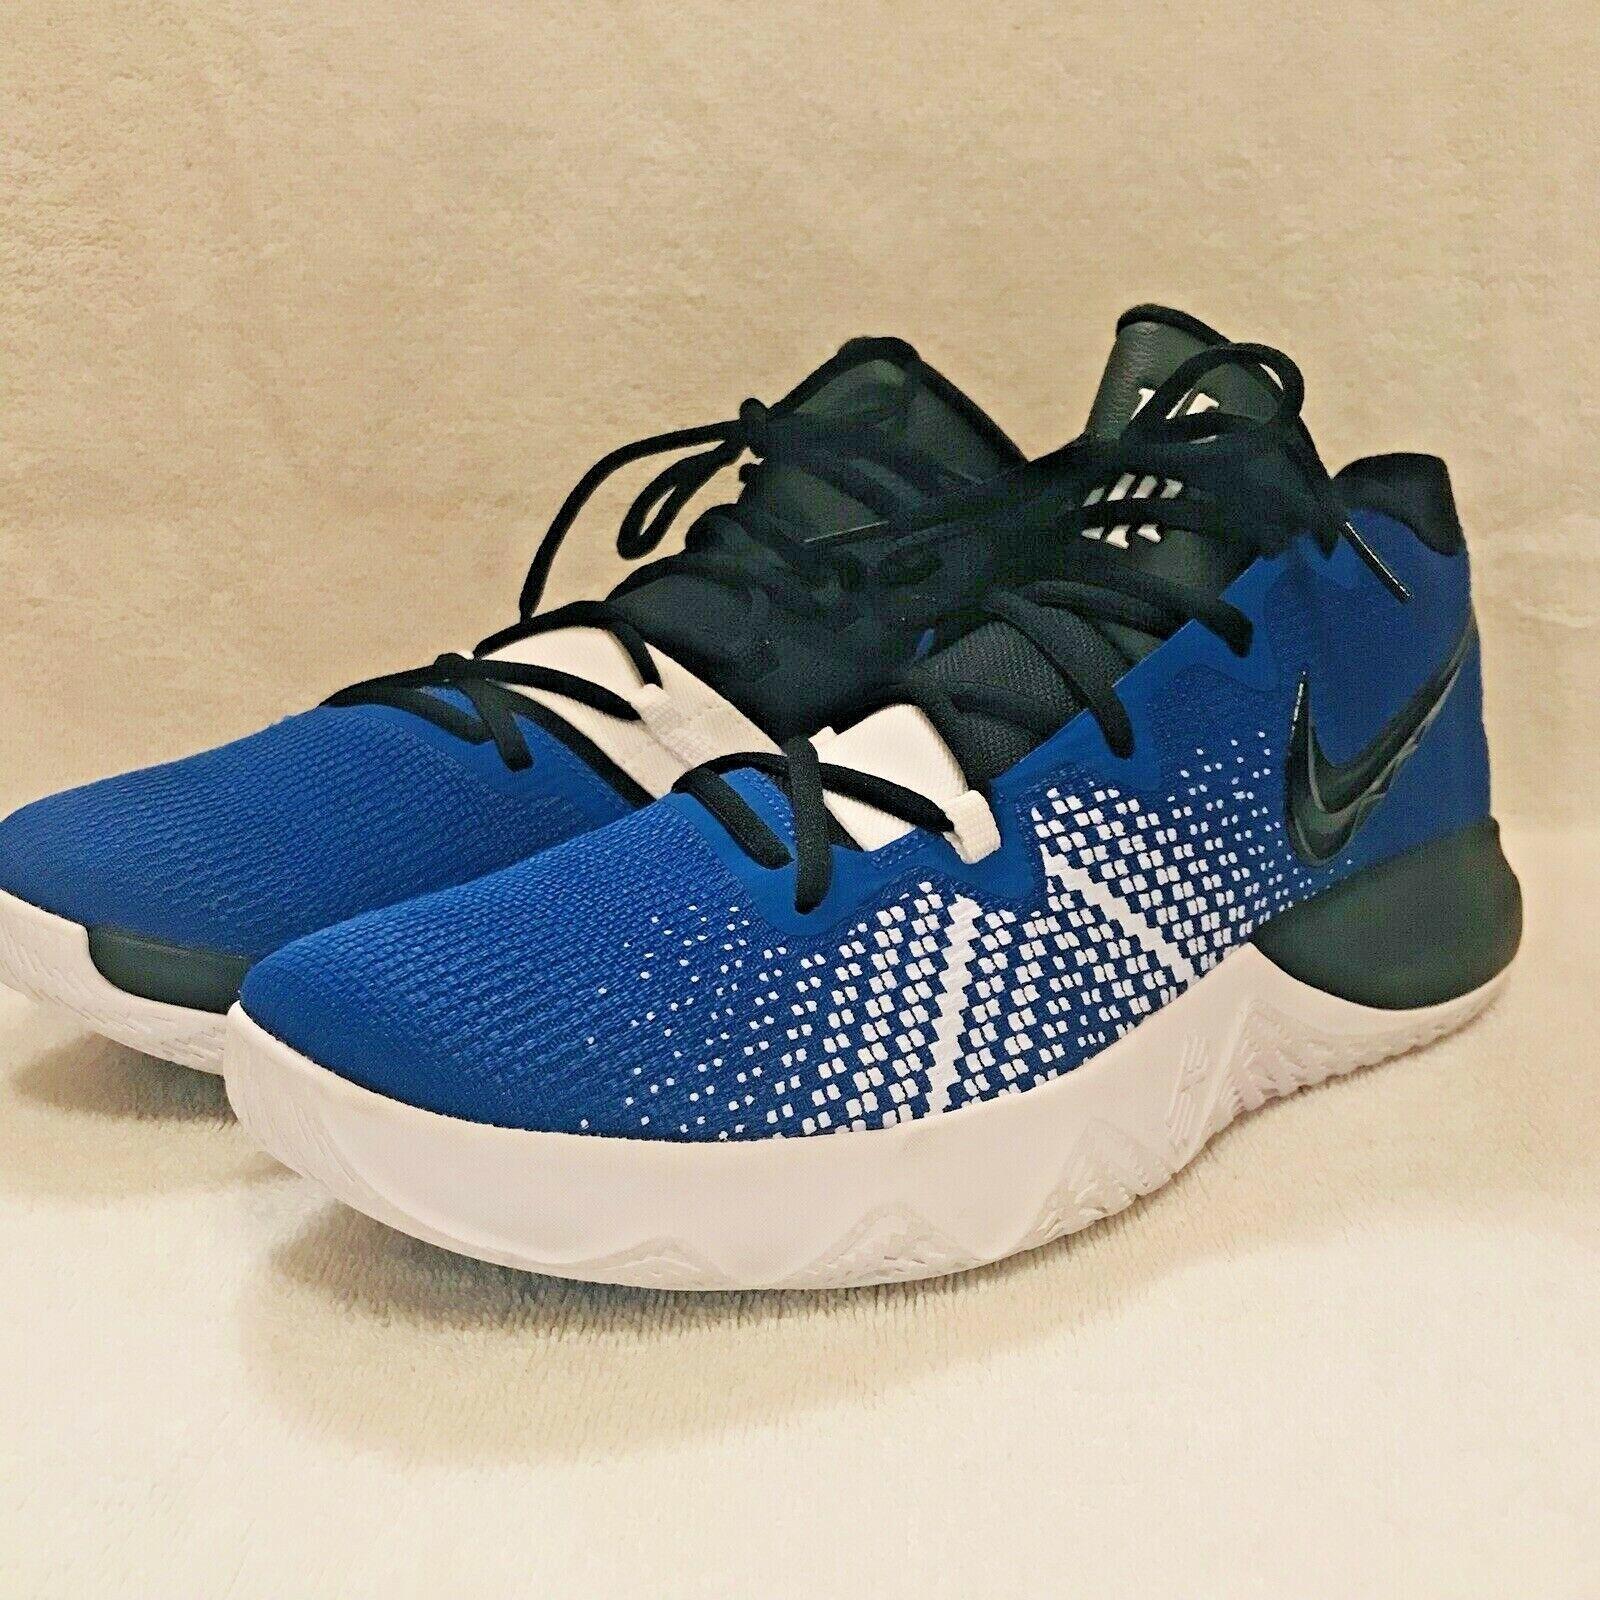 Nike Kyrie Flytrap blueee Black Men Basketball shoes Size 13 AA7071-400 (AA)